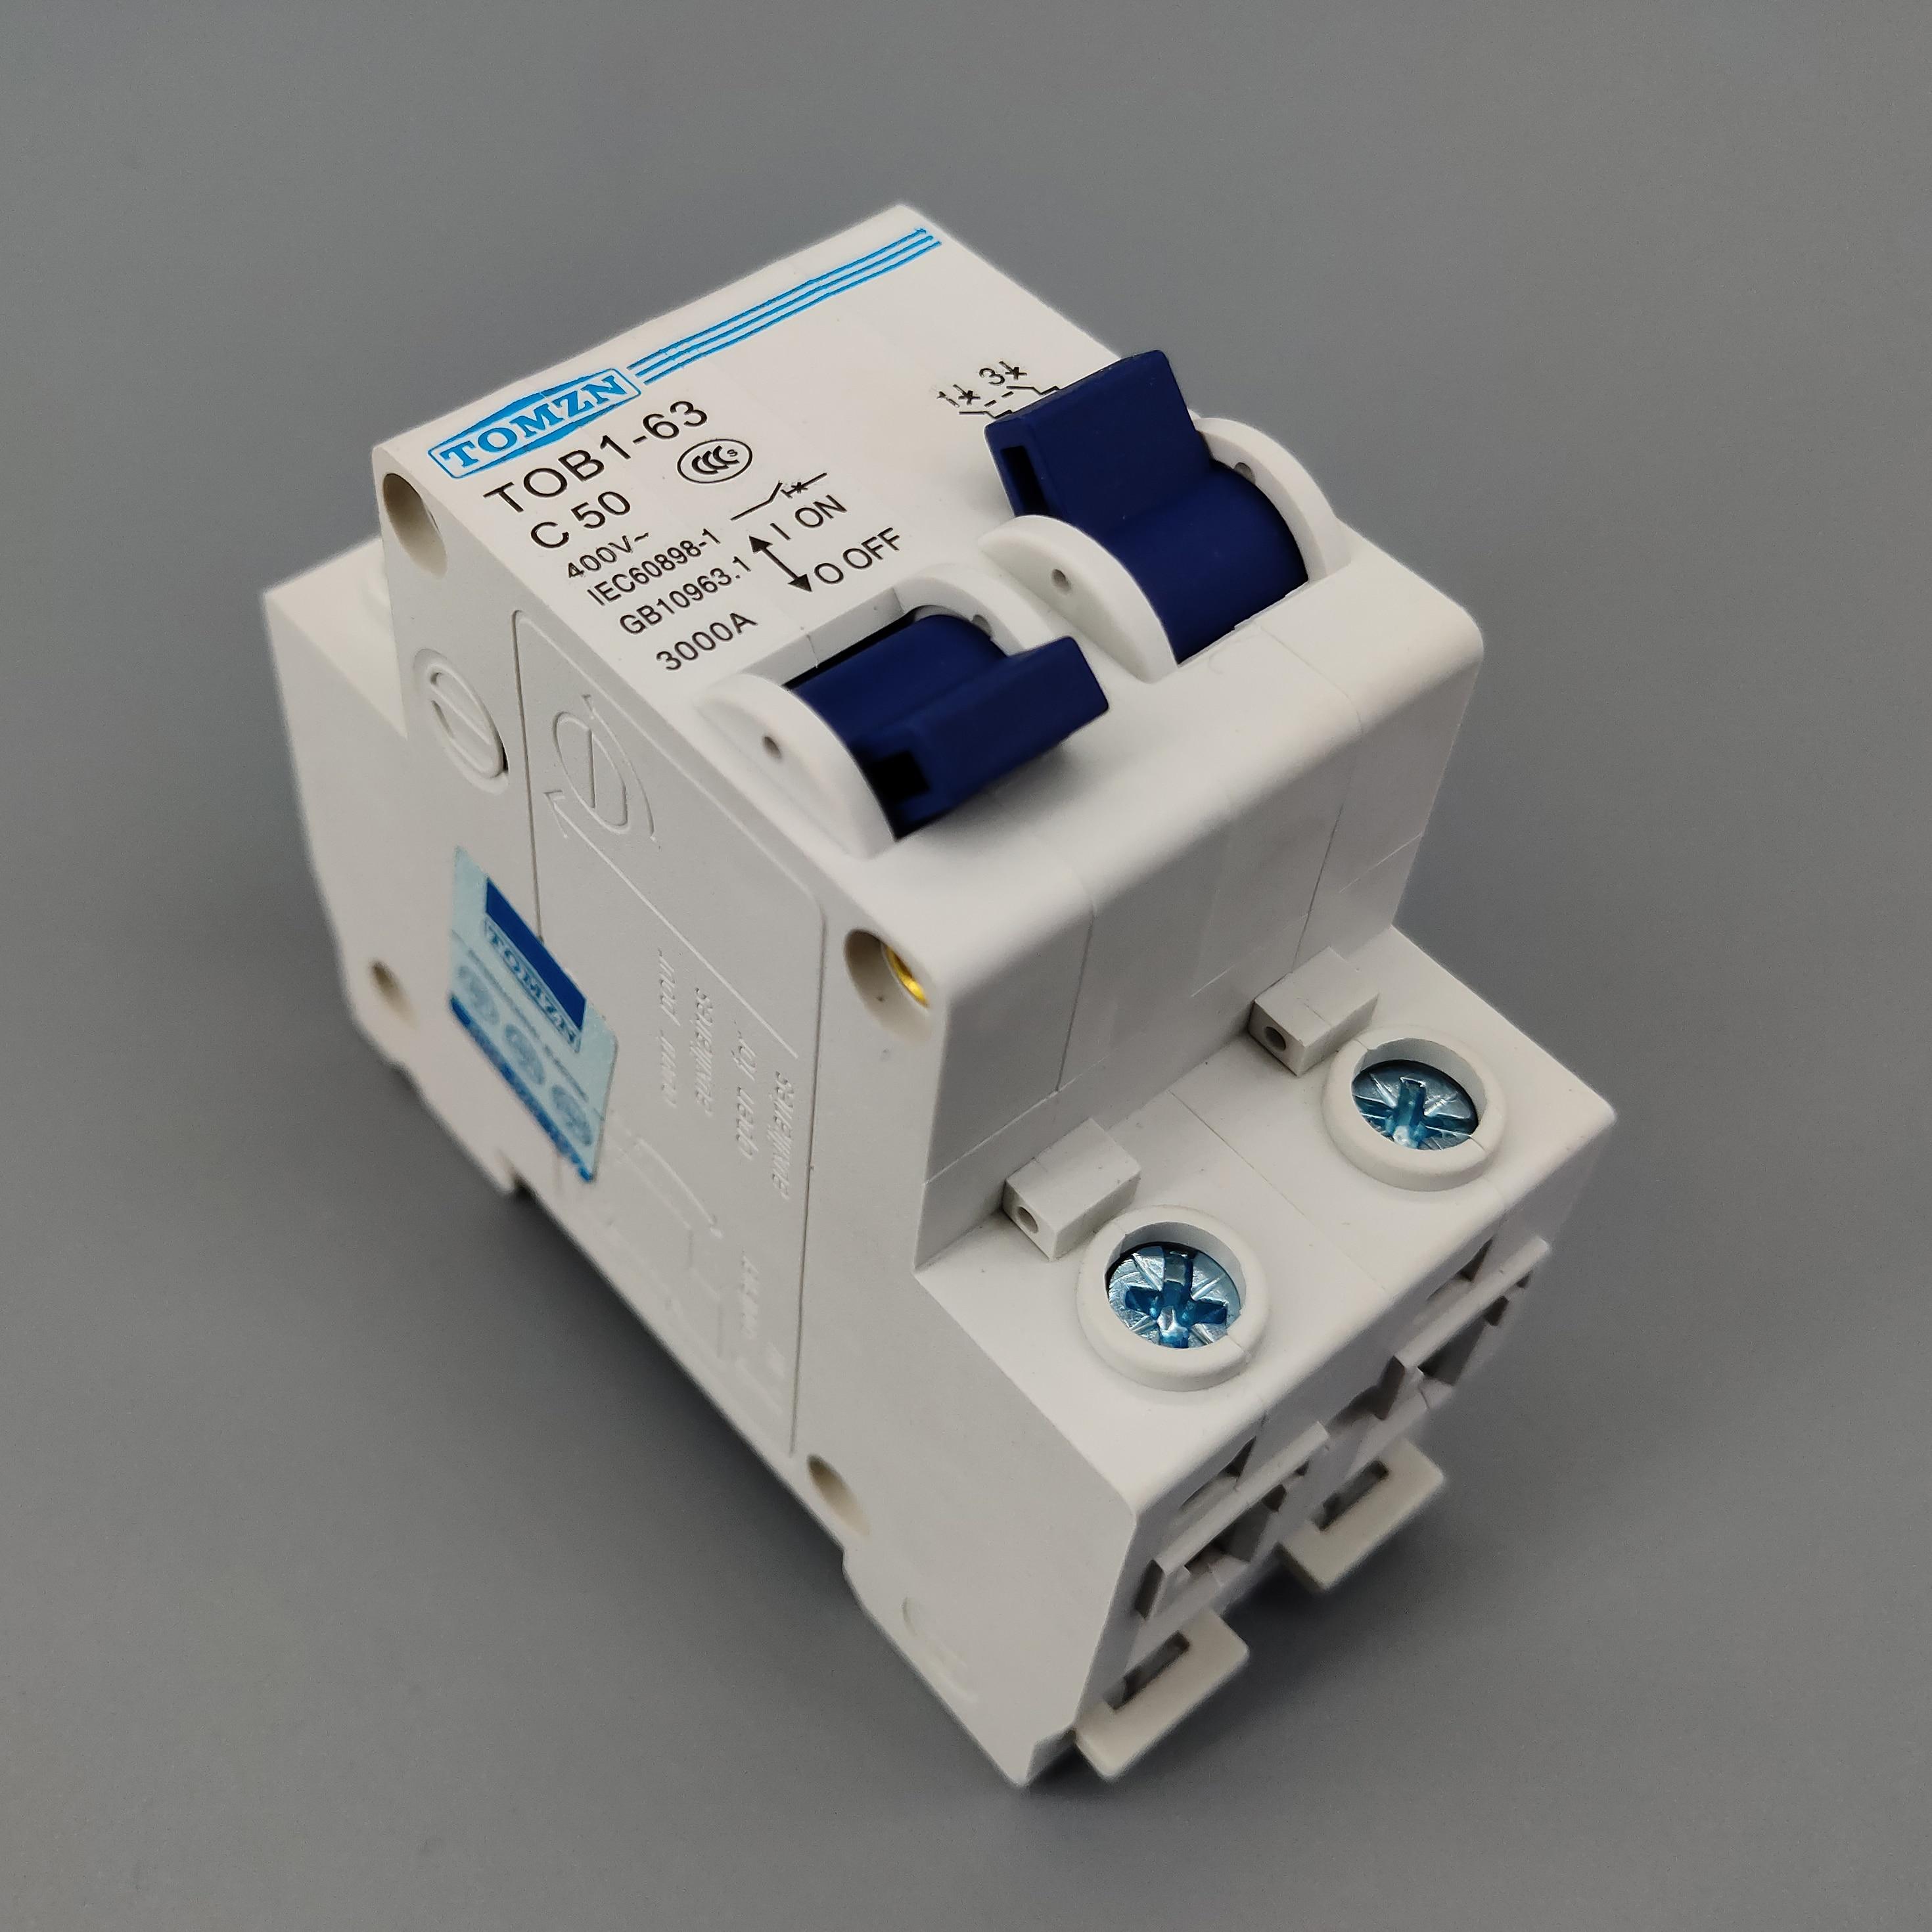 1P 50A MTS Manual transfer switch Circuit breaker MCB 50HZ/60HZ 400~